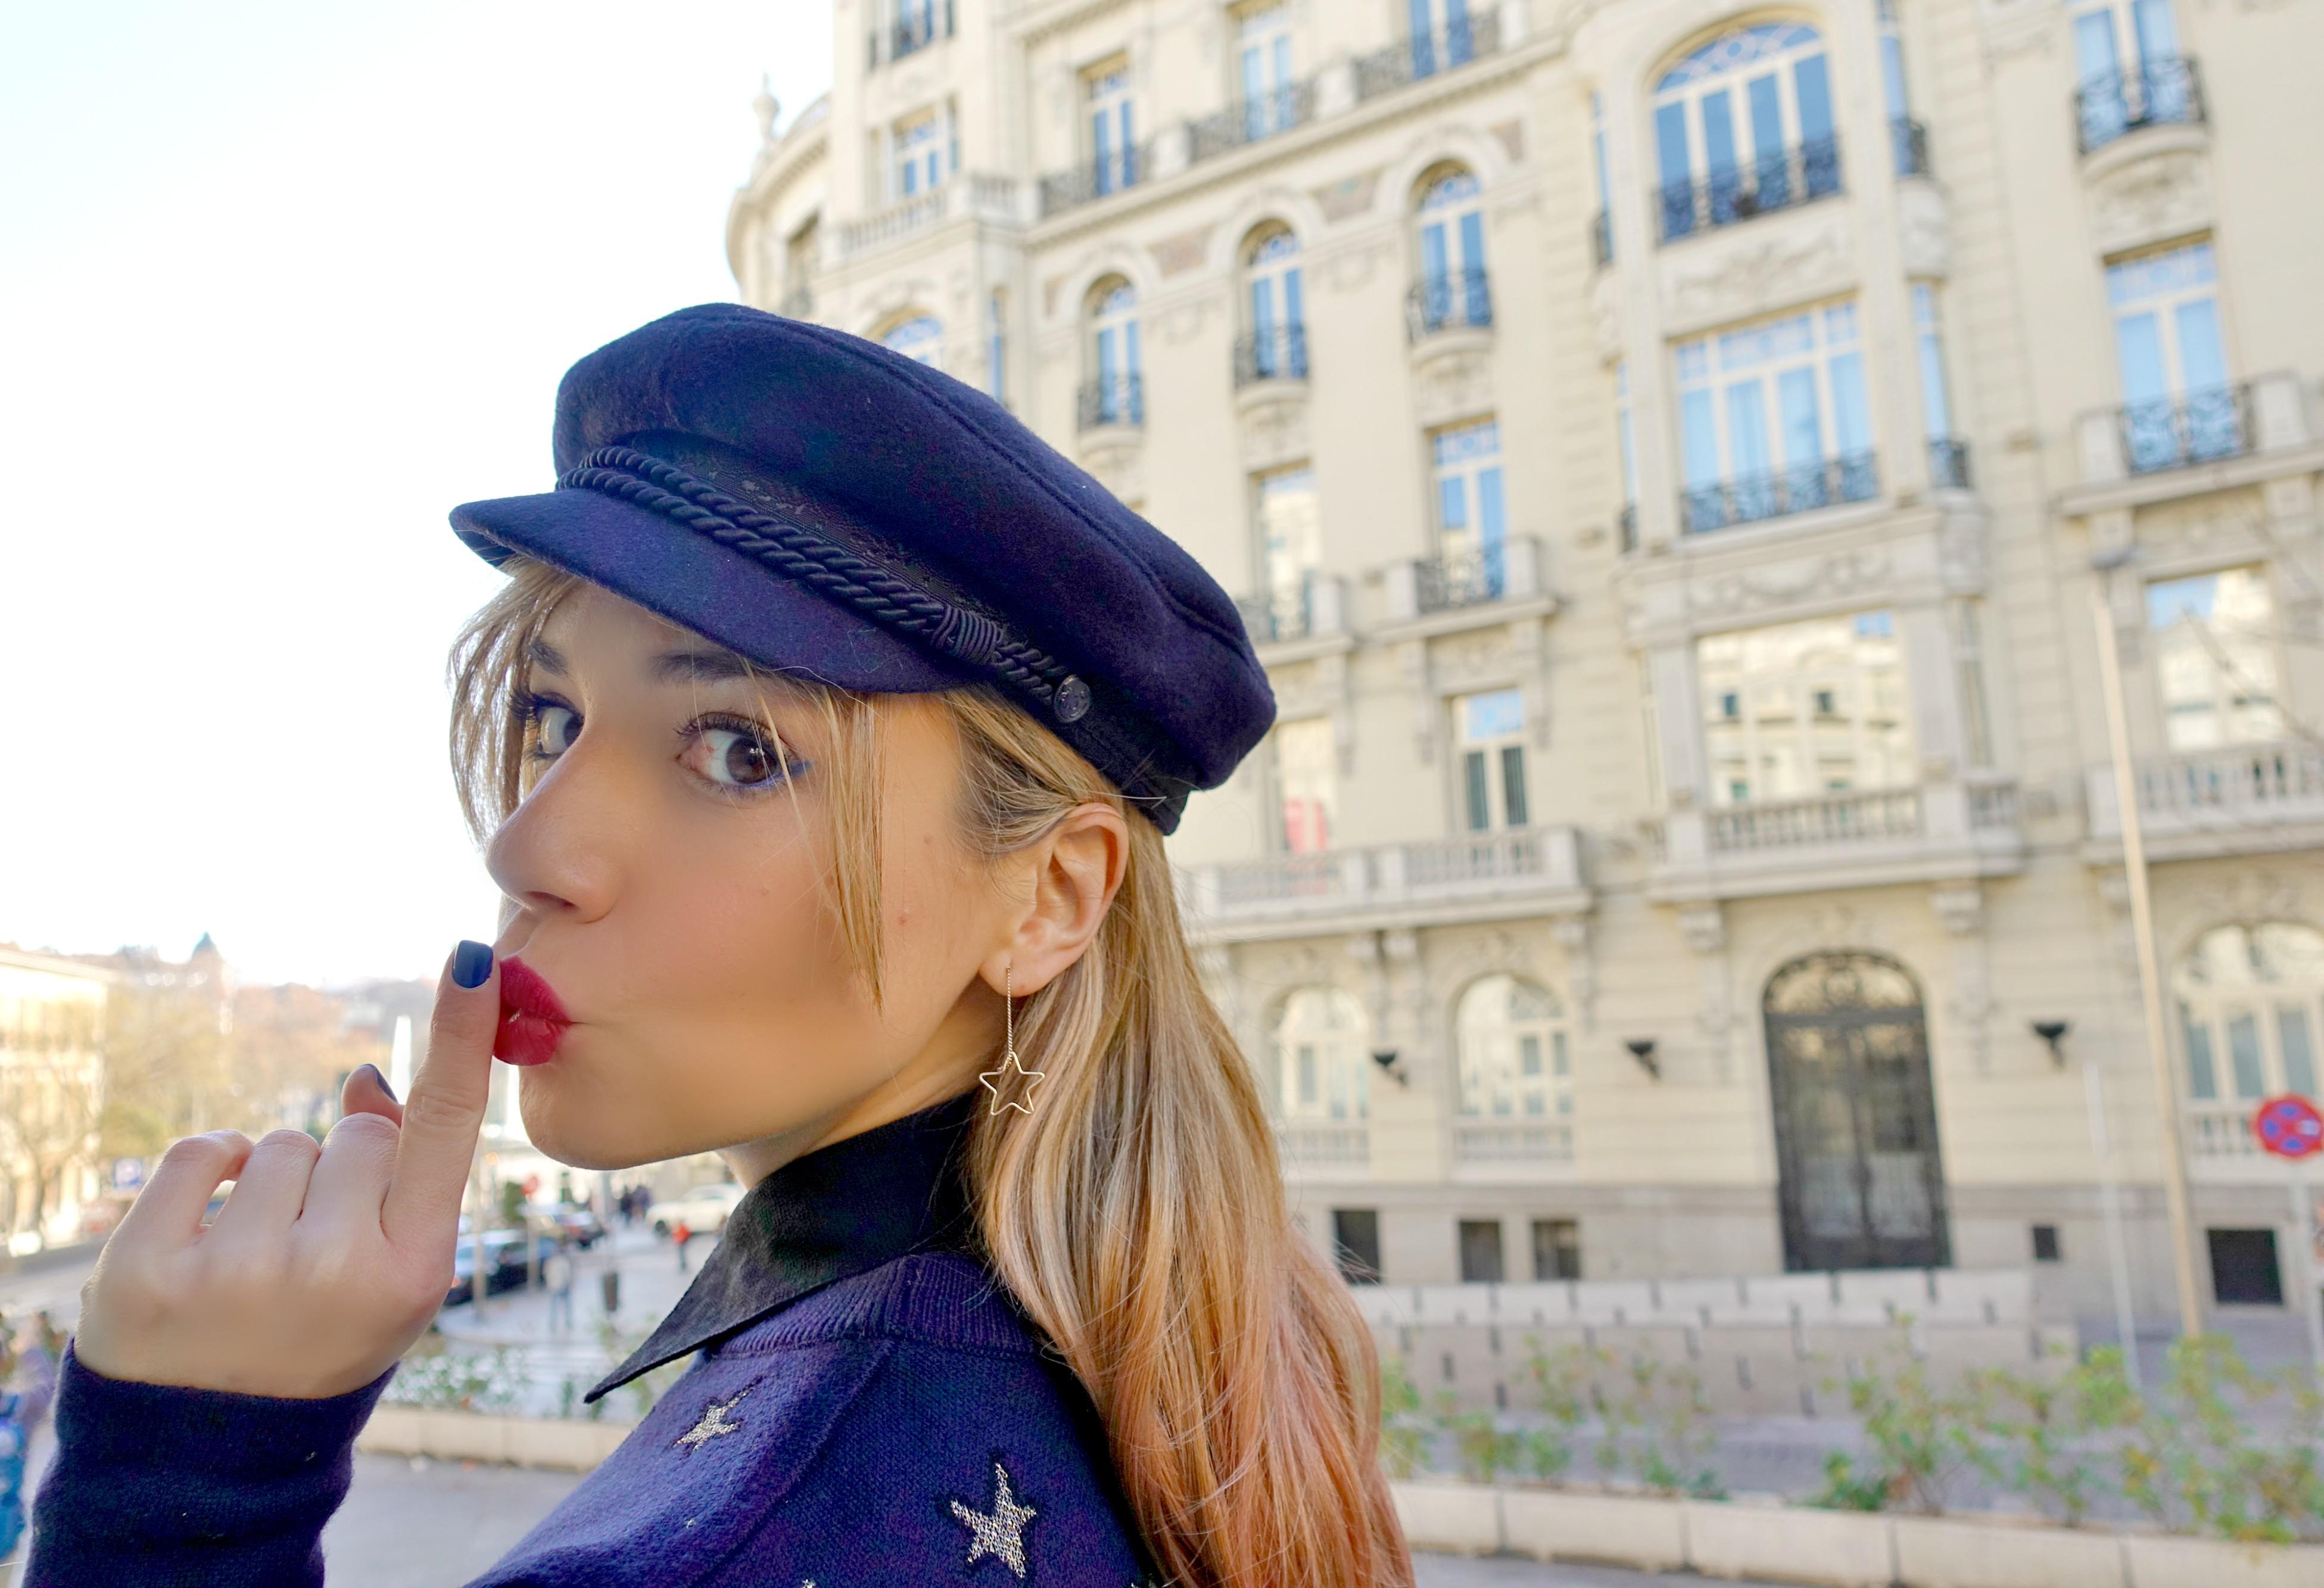 Pendientes-bijou-brigitte-blog-de-moda-ChicAdicta-influencer-Madrid-Chic-Adicta-look-Amichi-stars-outfit-PiensaenChic-Piensa-en-Chic